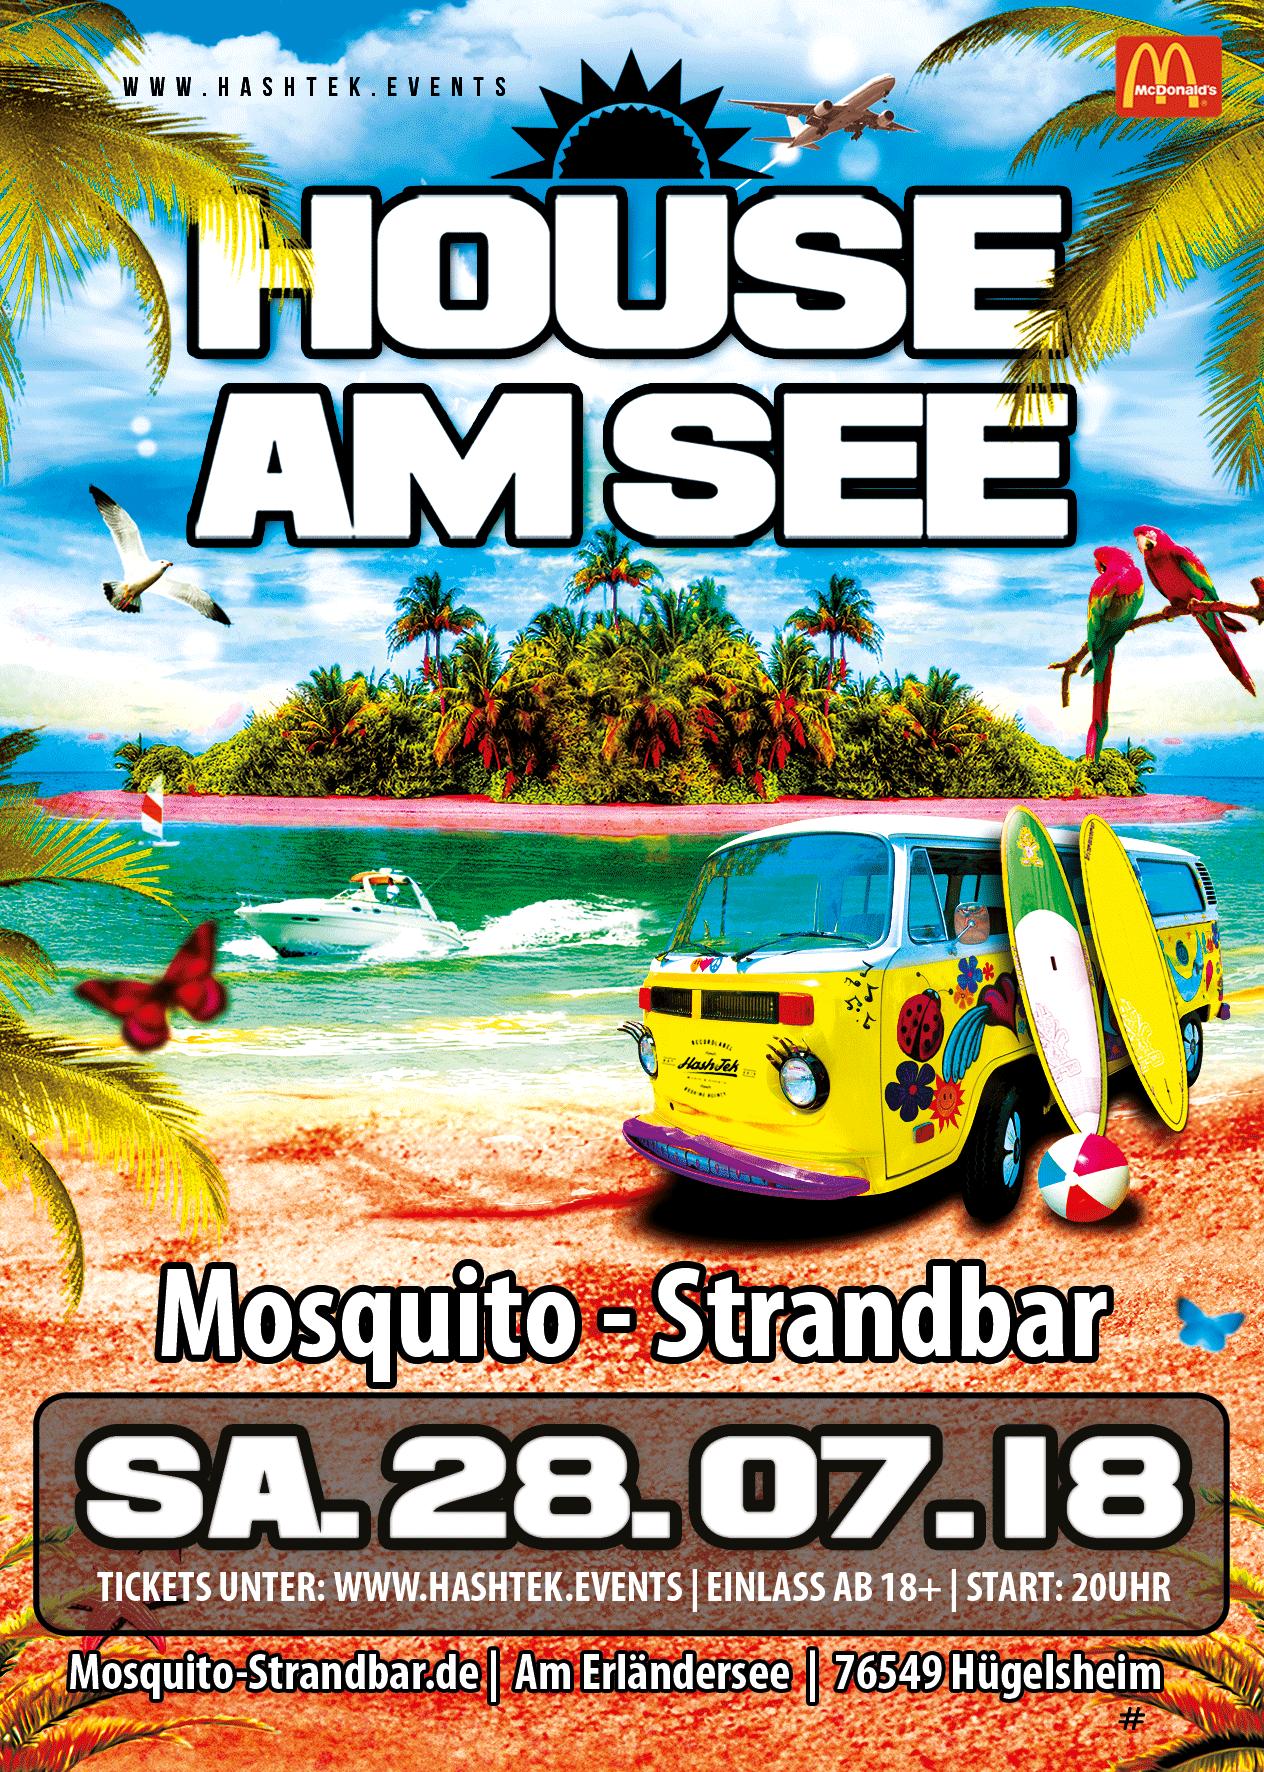 House am See - Mosquitobar - Mosquito Strandbar Hügelsheim